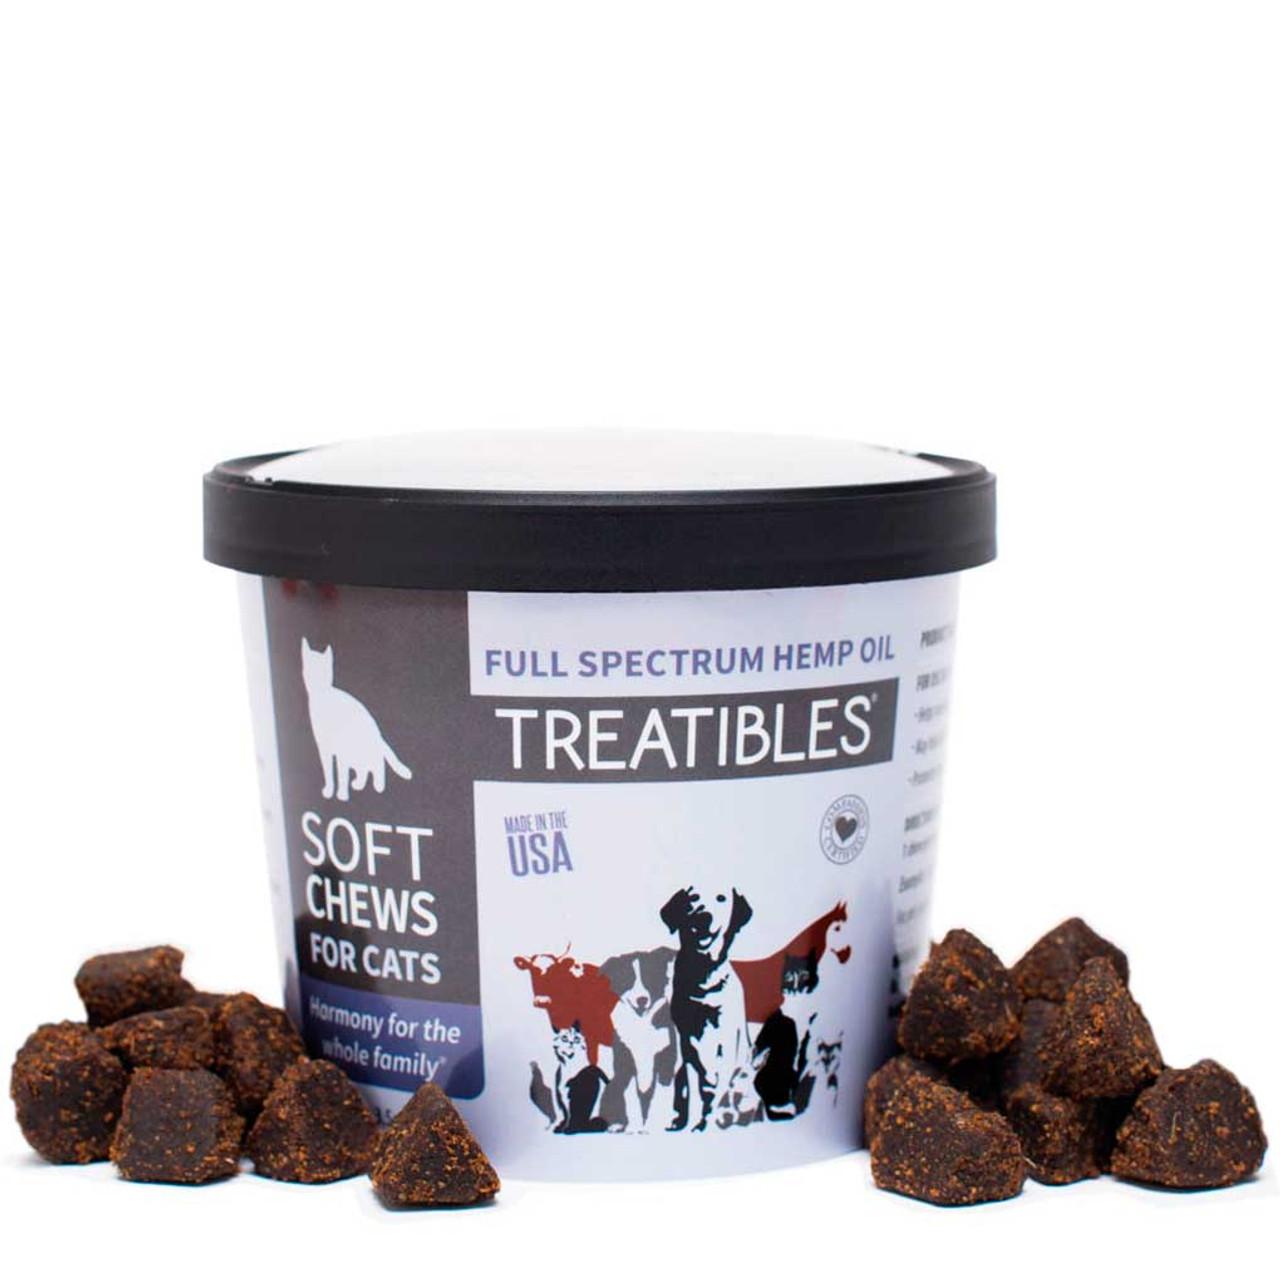 Treatibles CBD Treats | Soft Chews For Cats | hiphoundshop com